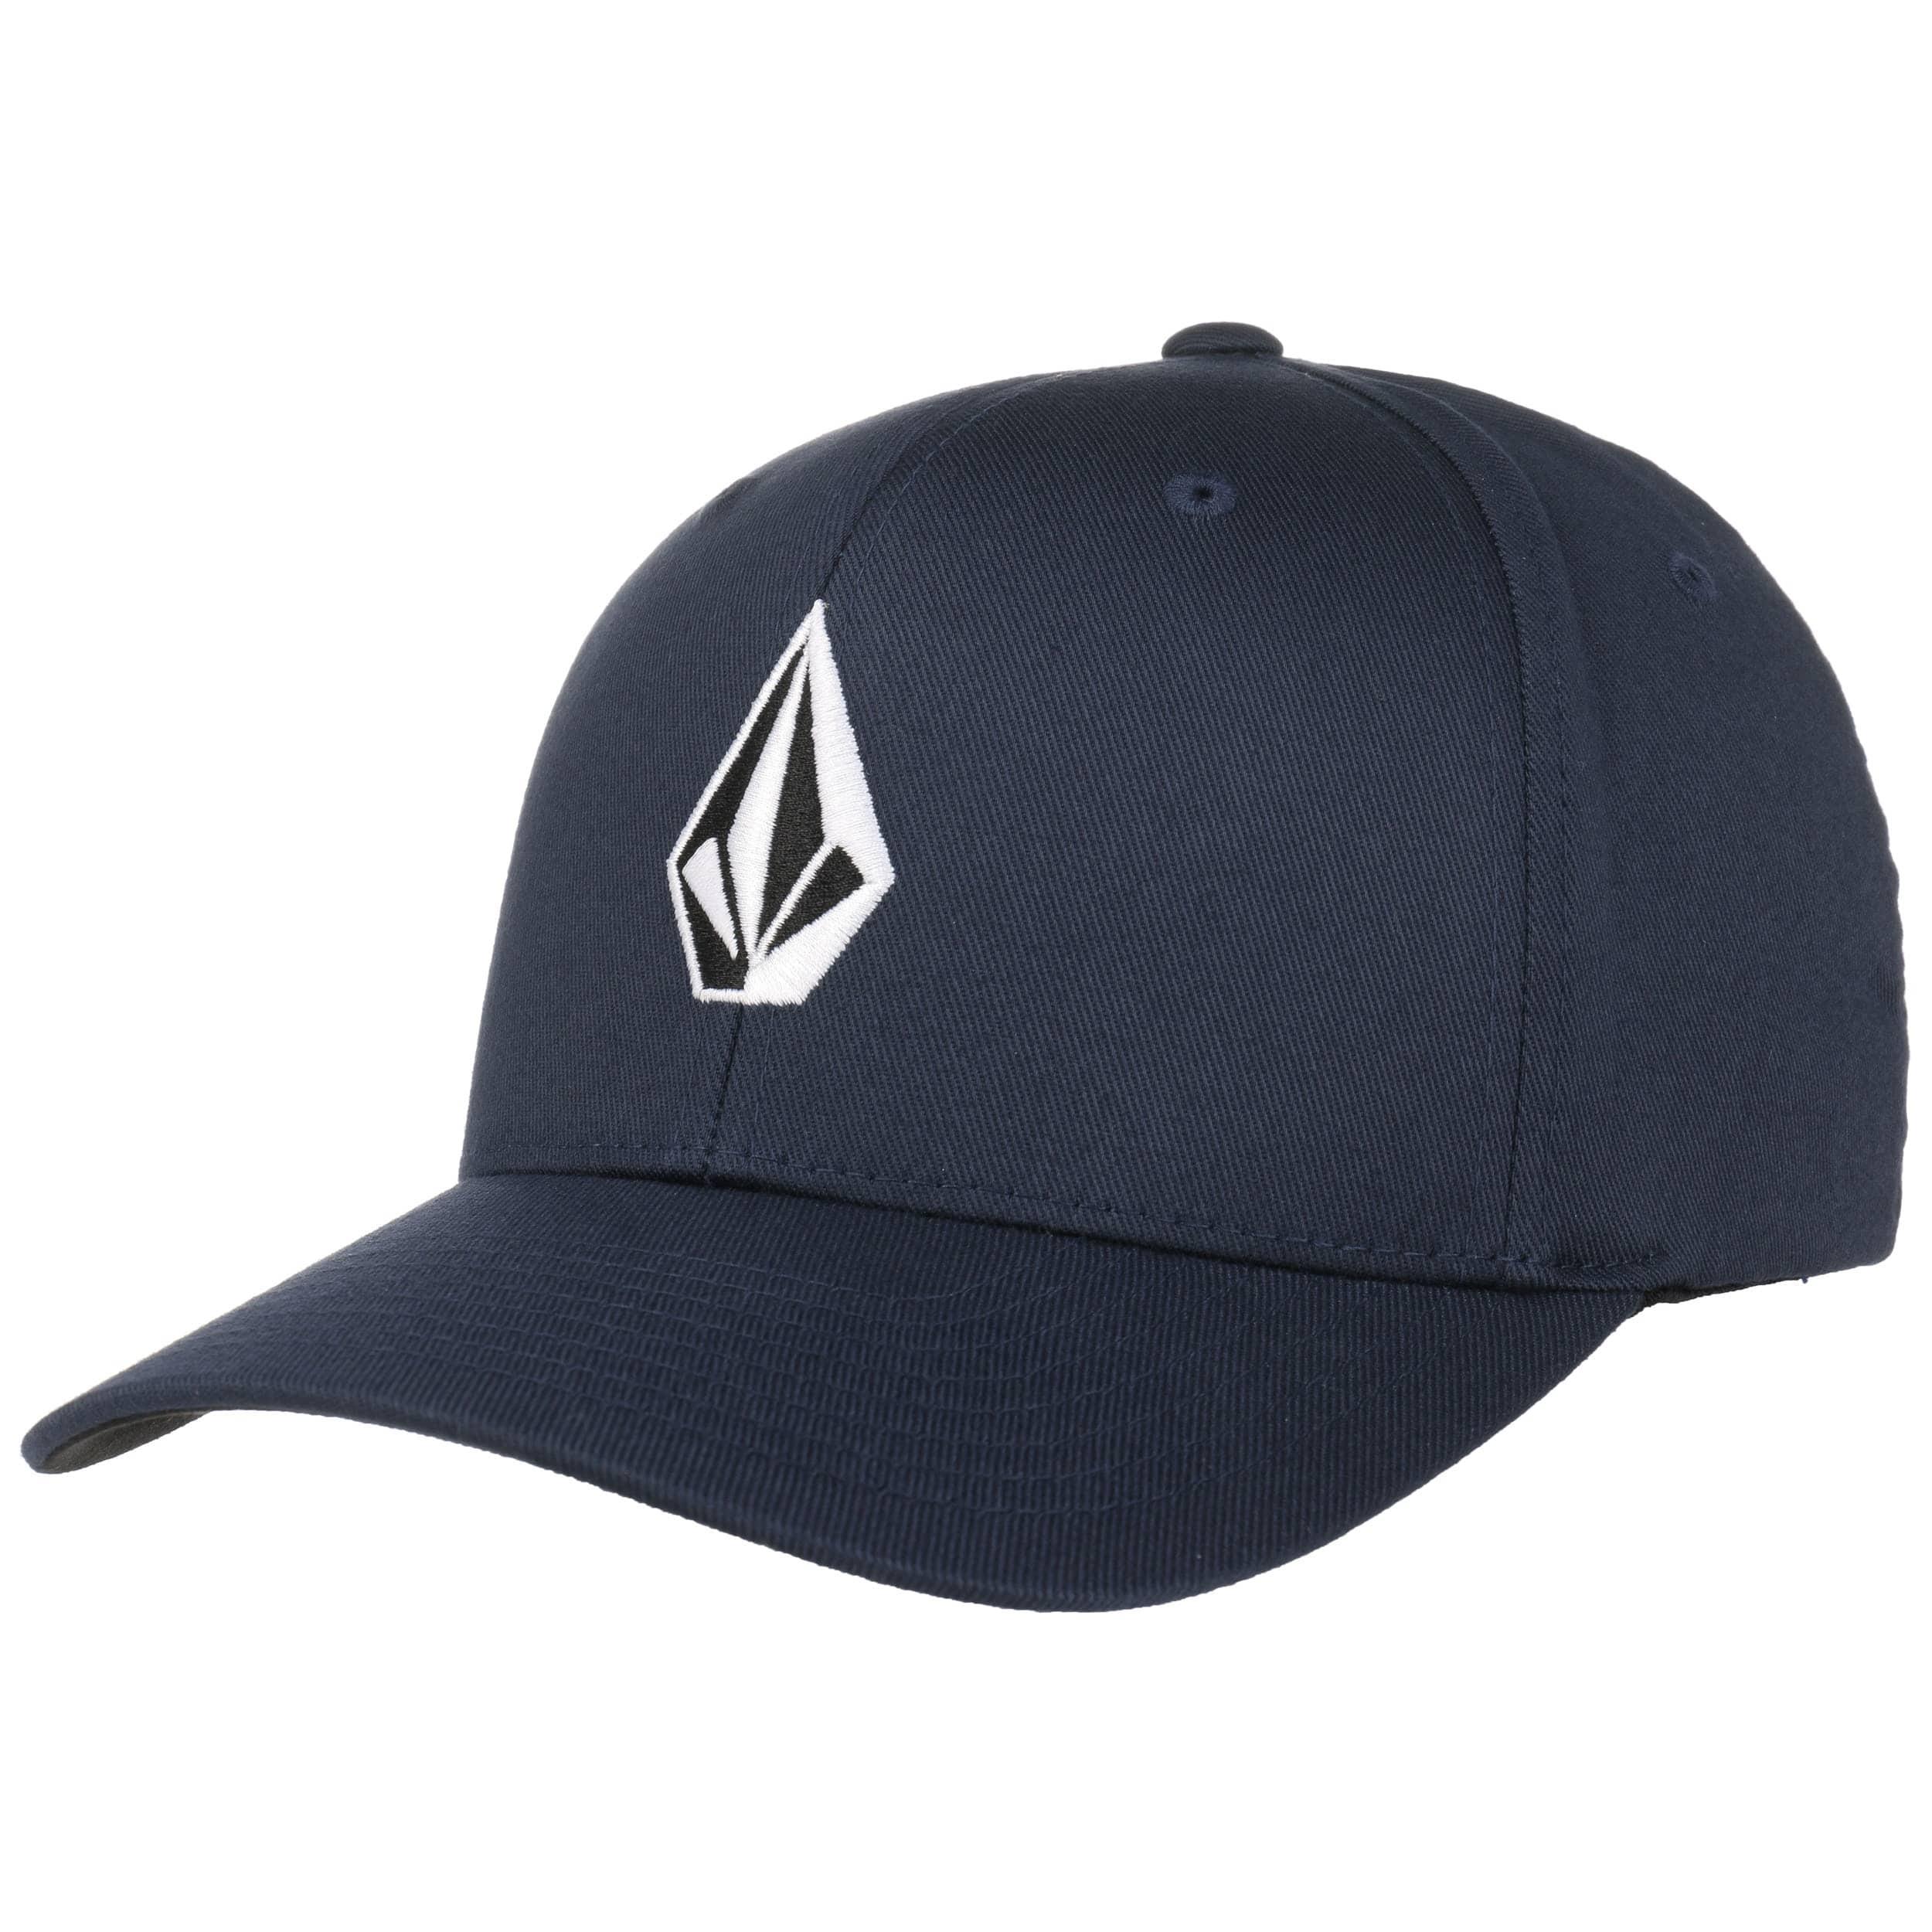 new styles 2c4e2 43c47 ... best price full stone flexfit cap by volcom navy 5 25691 a416e